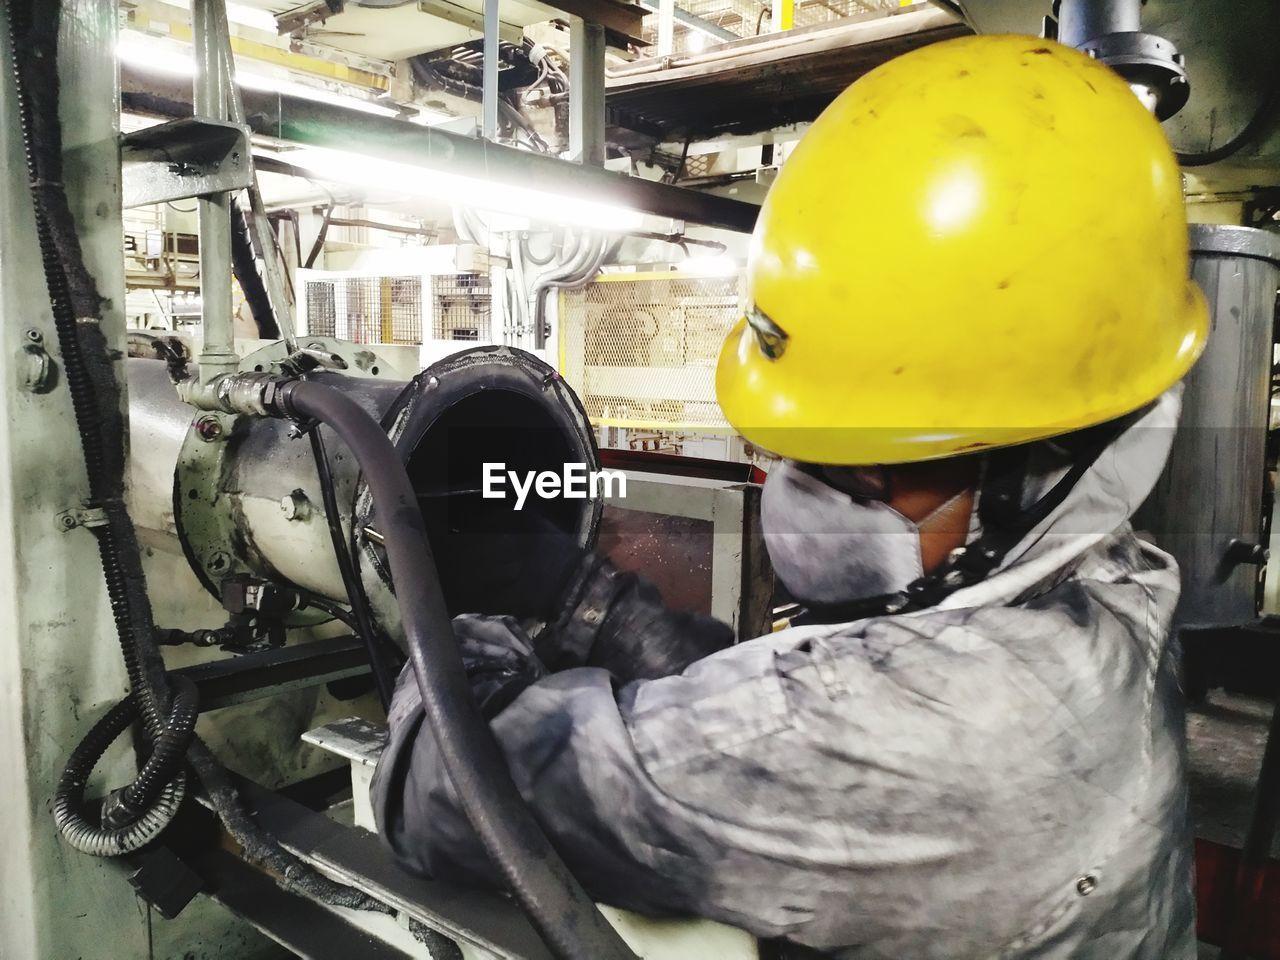 PEOPLE WORKING IN MACHINE